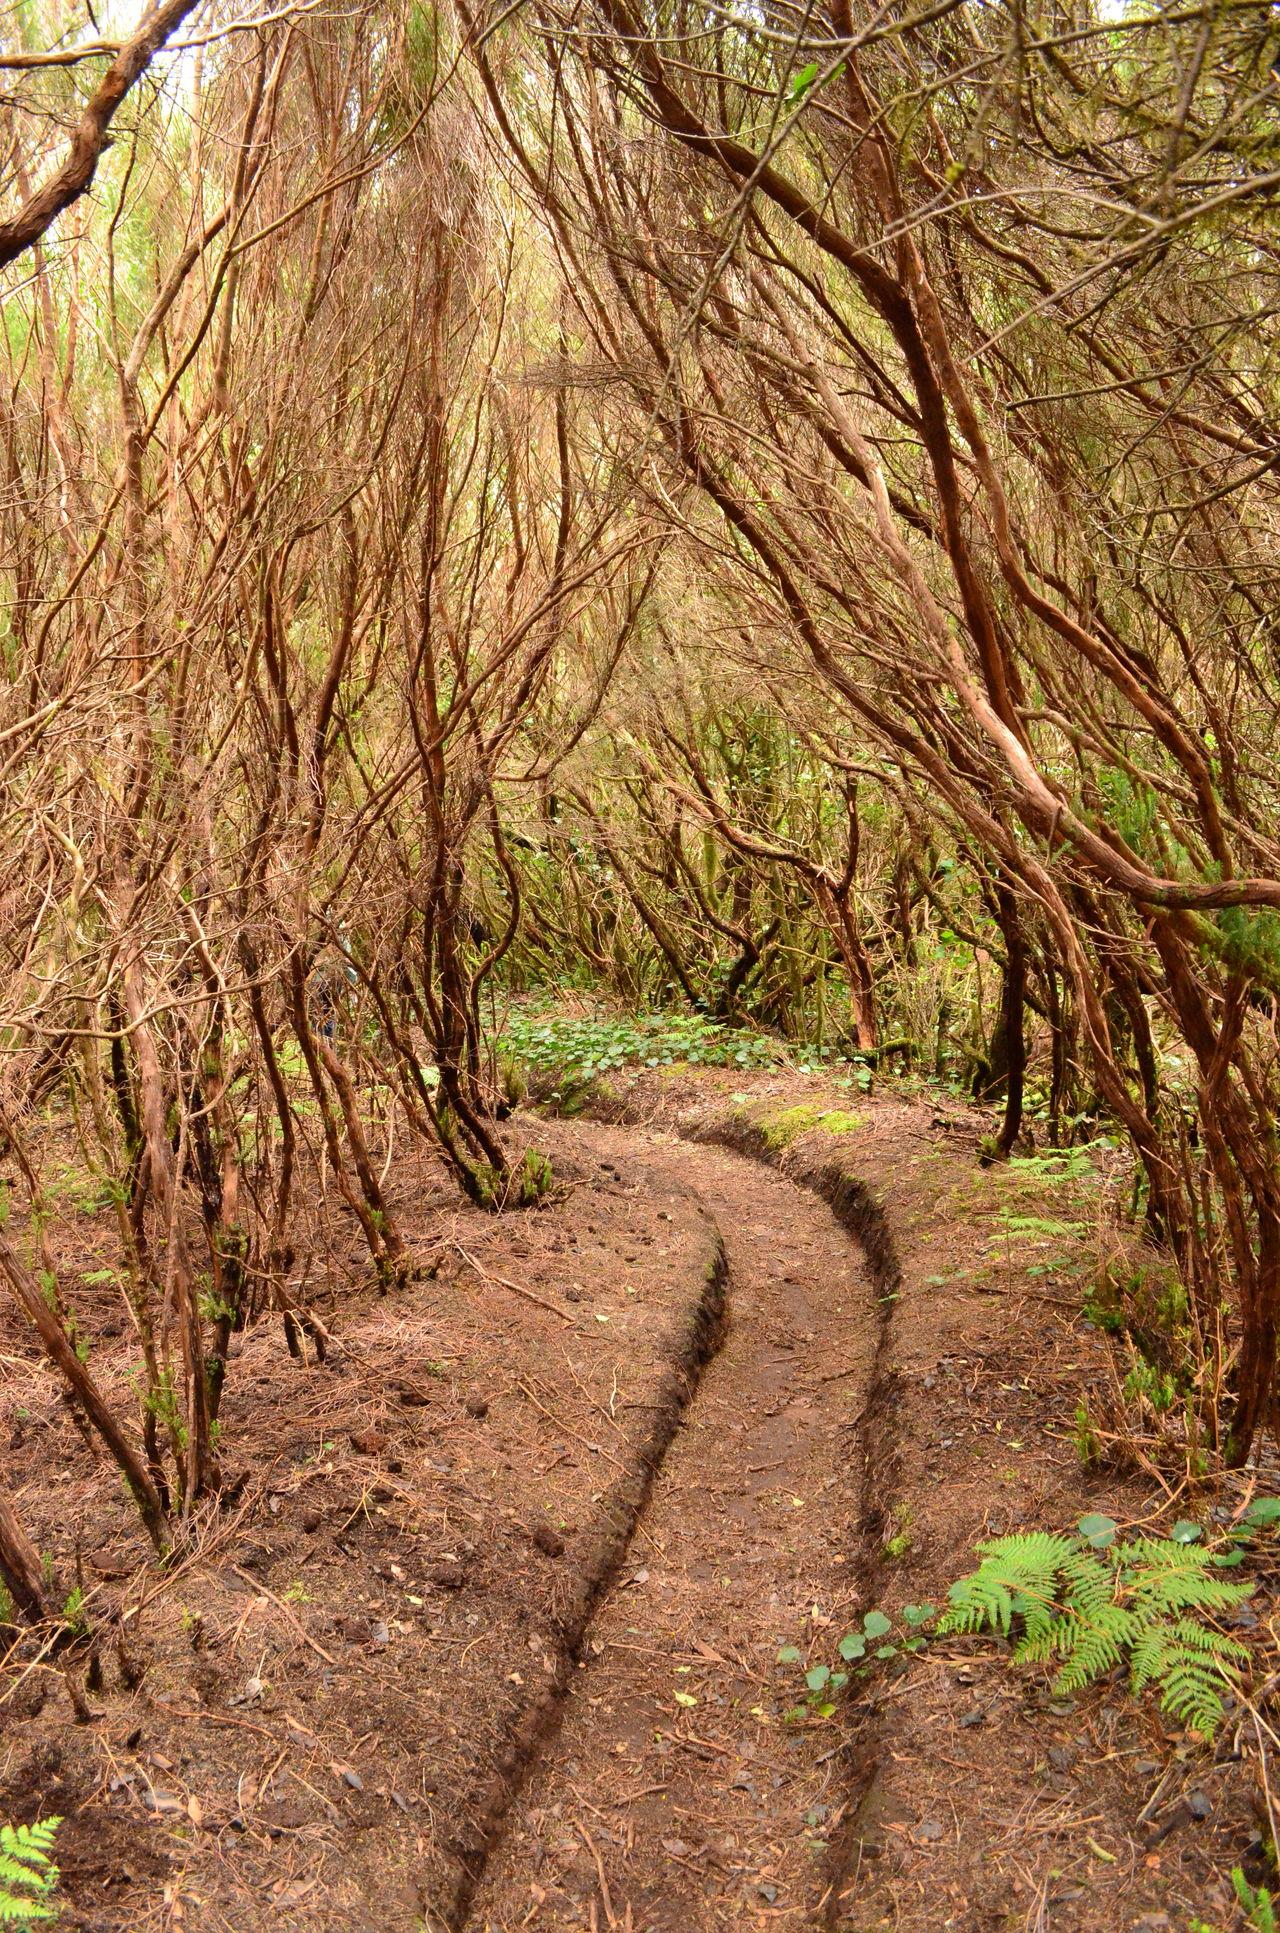 Anaga forest Anaga Mountains Anaga Tenerife Forest Hiking Trail Nature Outdoors Tenerife Island Teneriffa Tree Trees